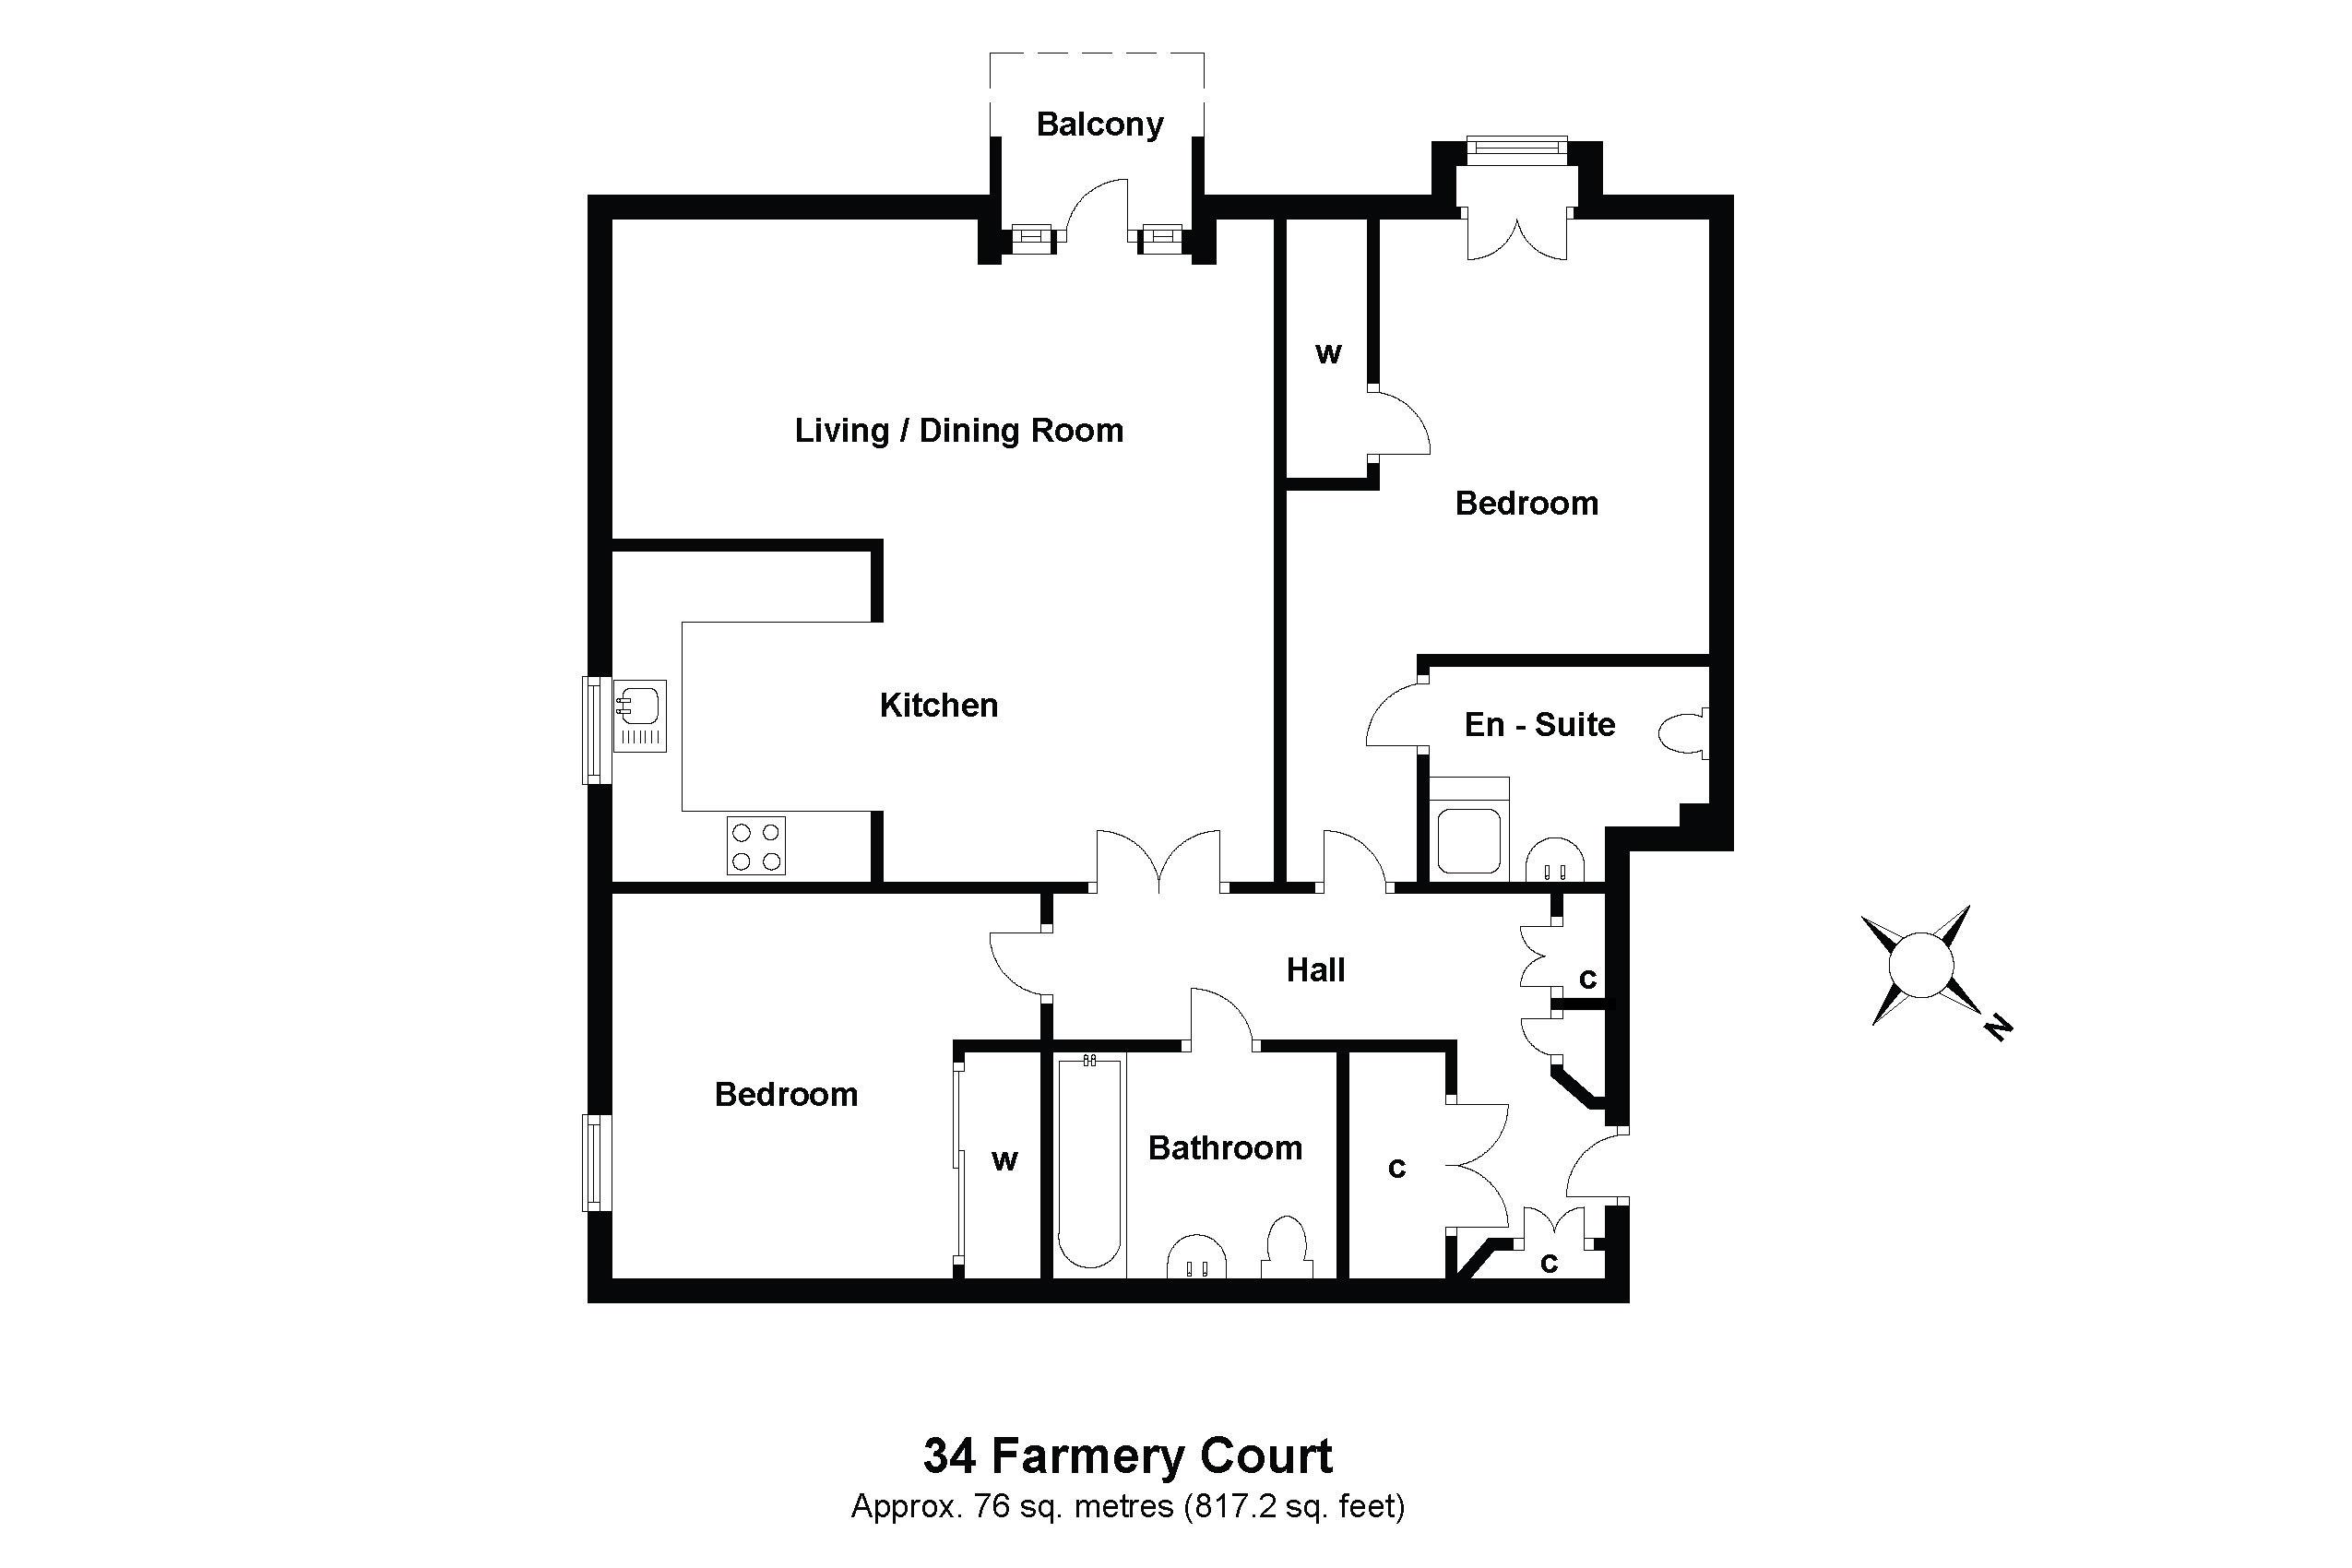 34 Farmery Court Floorplan